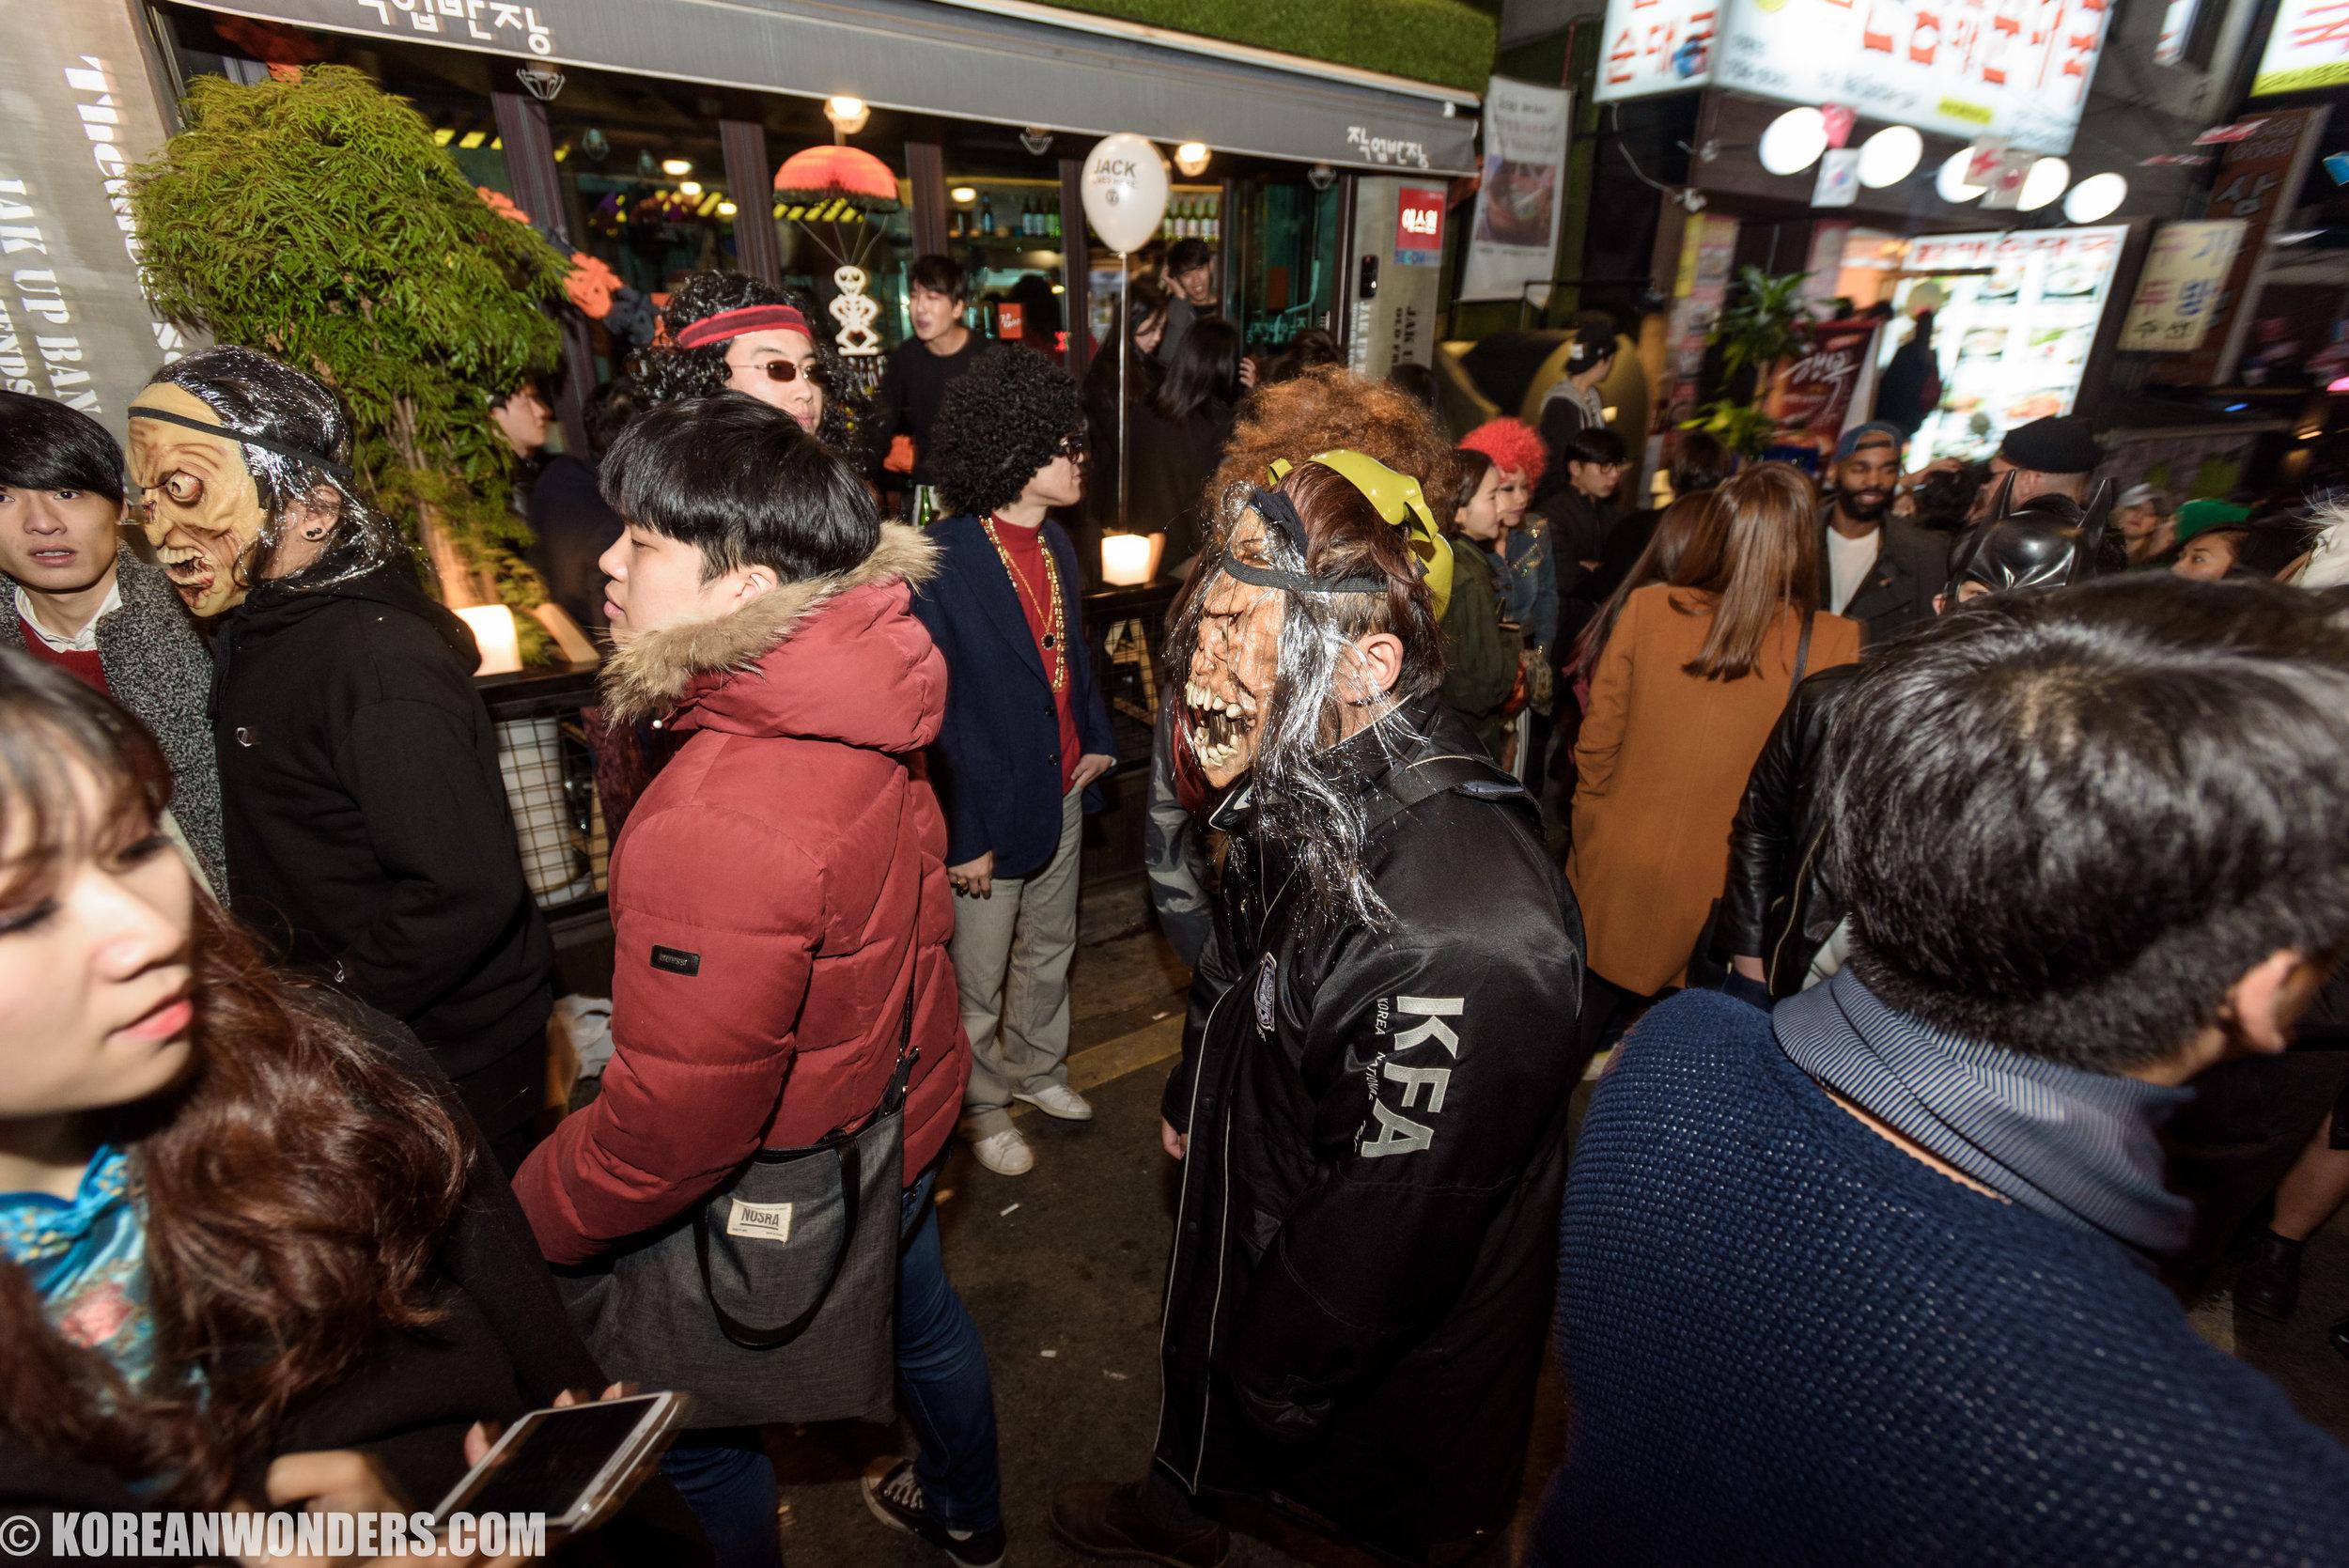 Halloween in Itaewon - 2015.10.31 (Sat)